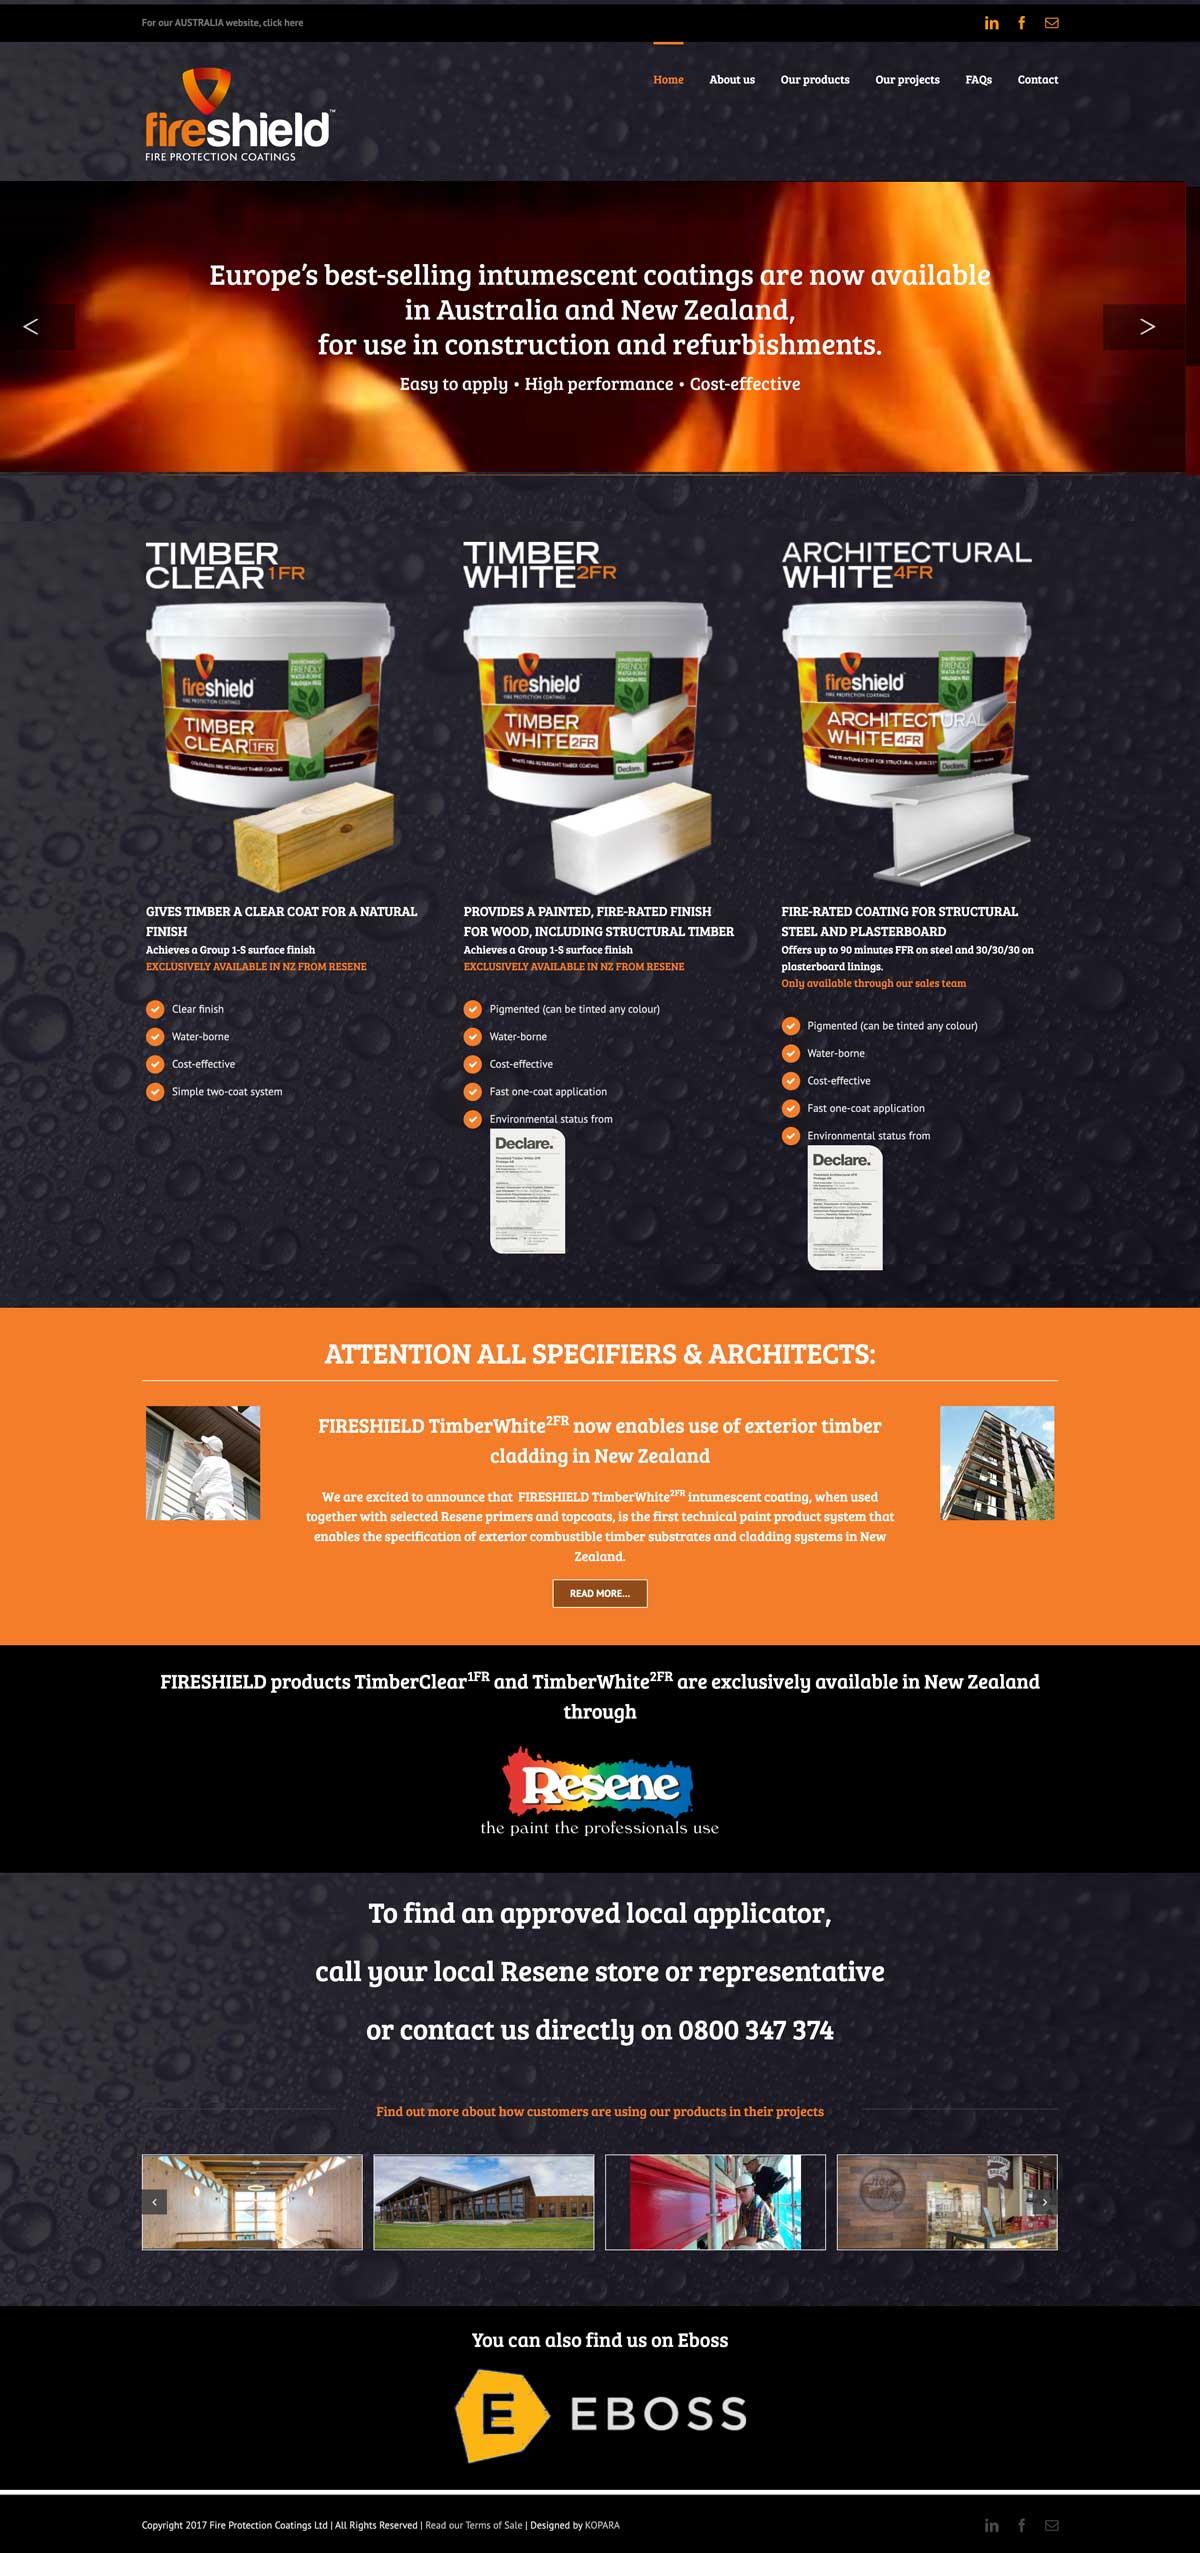 christchurch website design nz marketing products